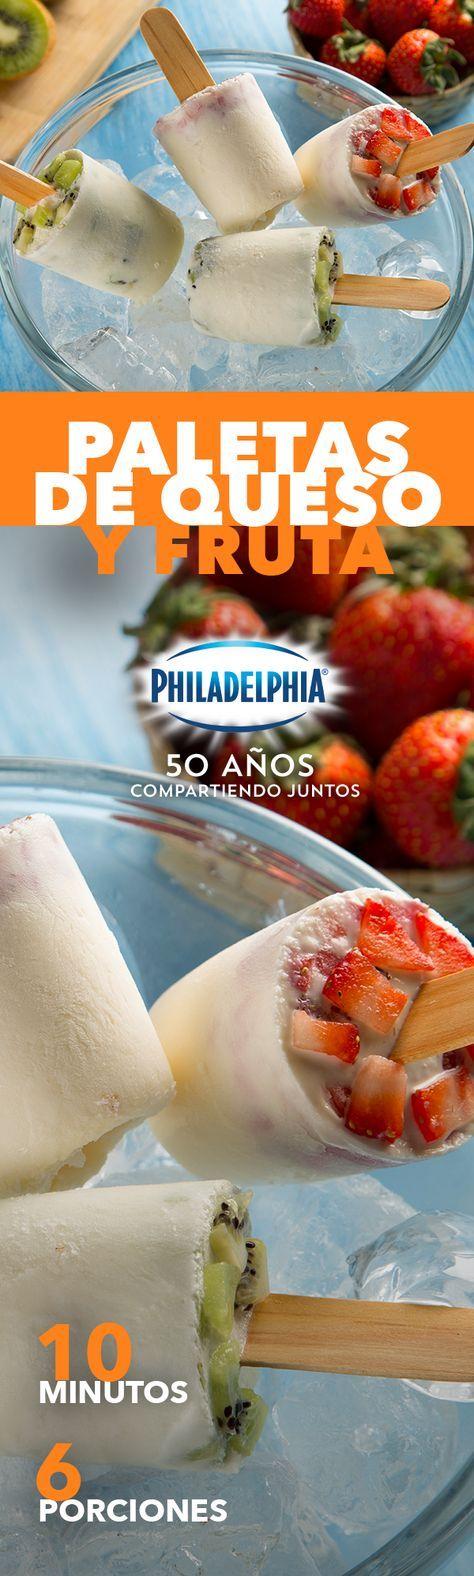 Te conocemos tanto que sabemos que siempre buscas algo refrescante para le postre. #recetas #receta #quesophiladelphia #philadelphia #quesocrema #queso #comida #cocinar #cocinamexicana #recetasfáciles #recetasPhiladelphia #recetasdecocina #comer #fruta #paletas #helado #paletasheladas #paletasdefruta #frutas #fresa #kiwi #durazno #postre #postres